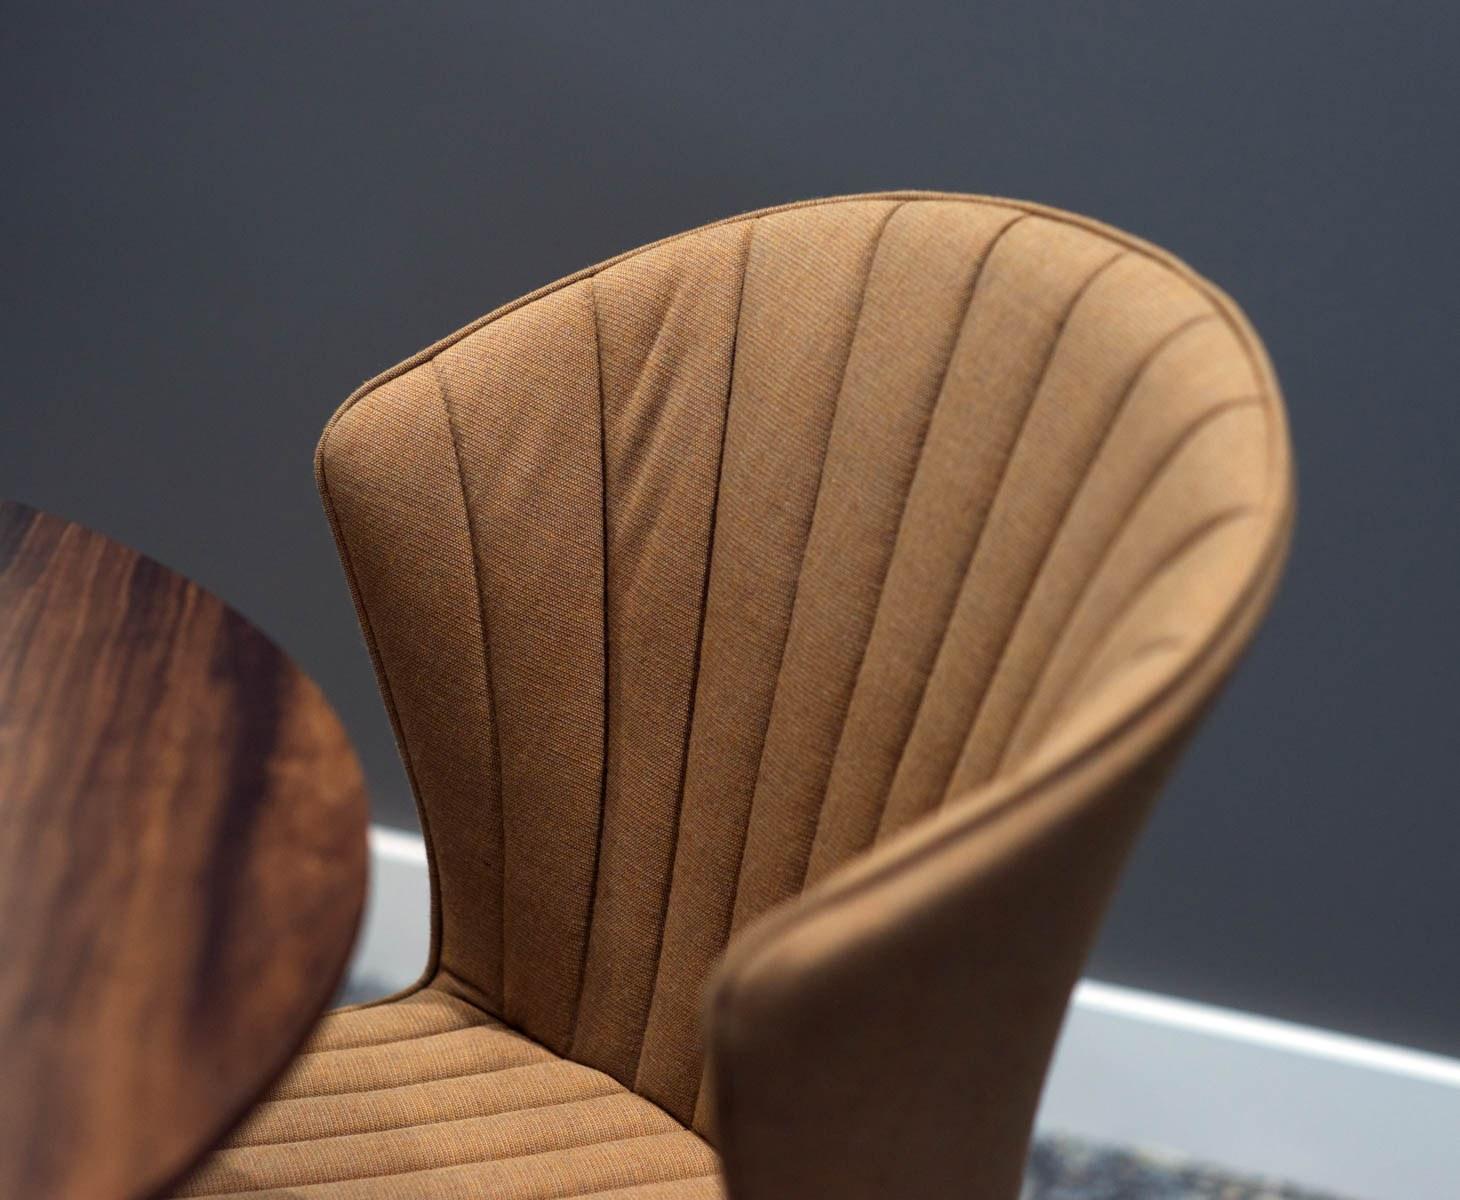 Lane4 soft office armchair